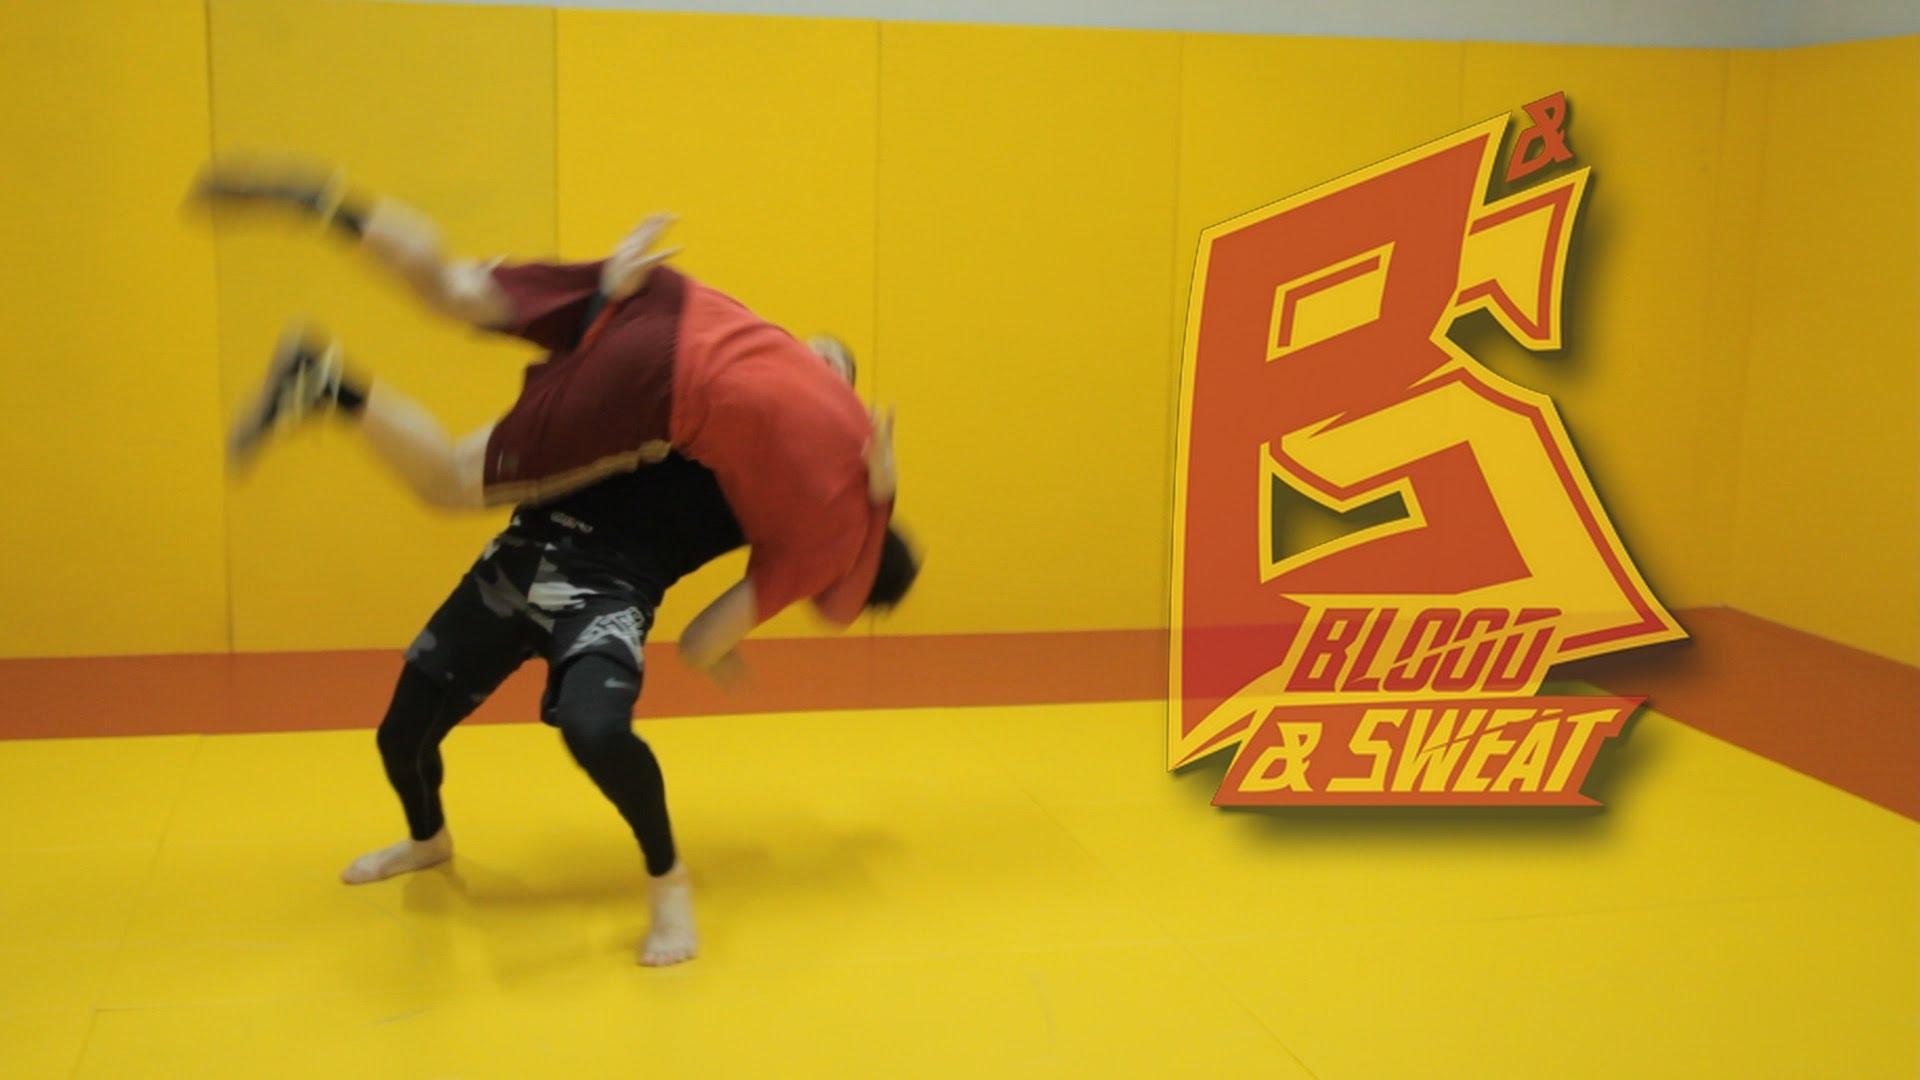 Russian Technique: Escape guillotine with a throw